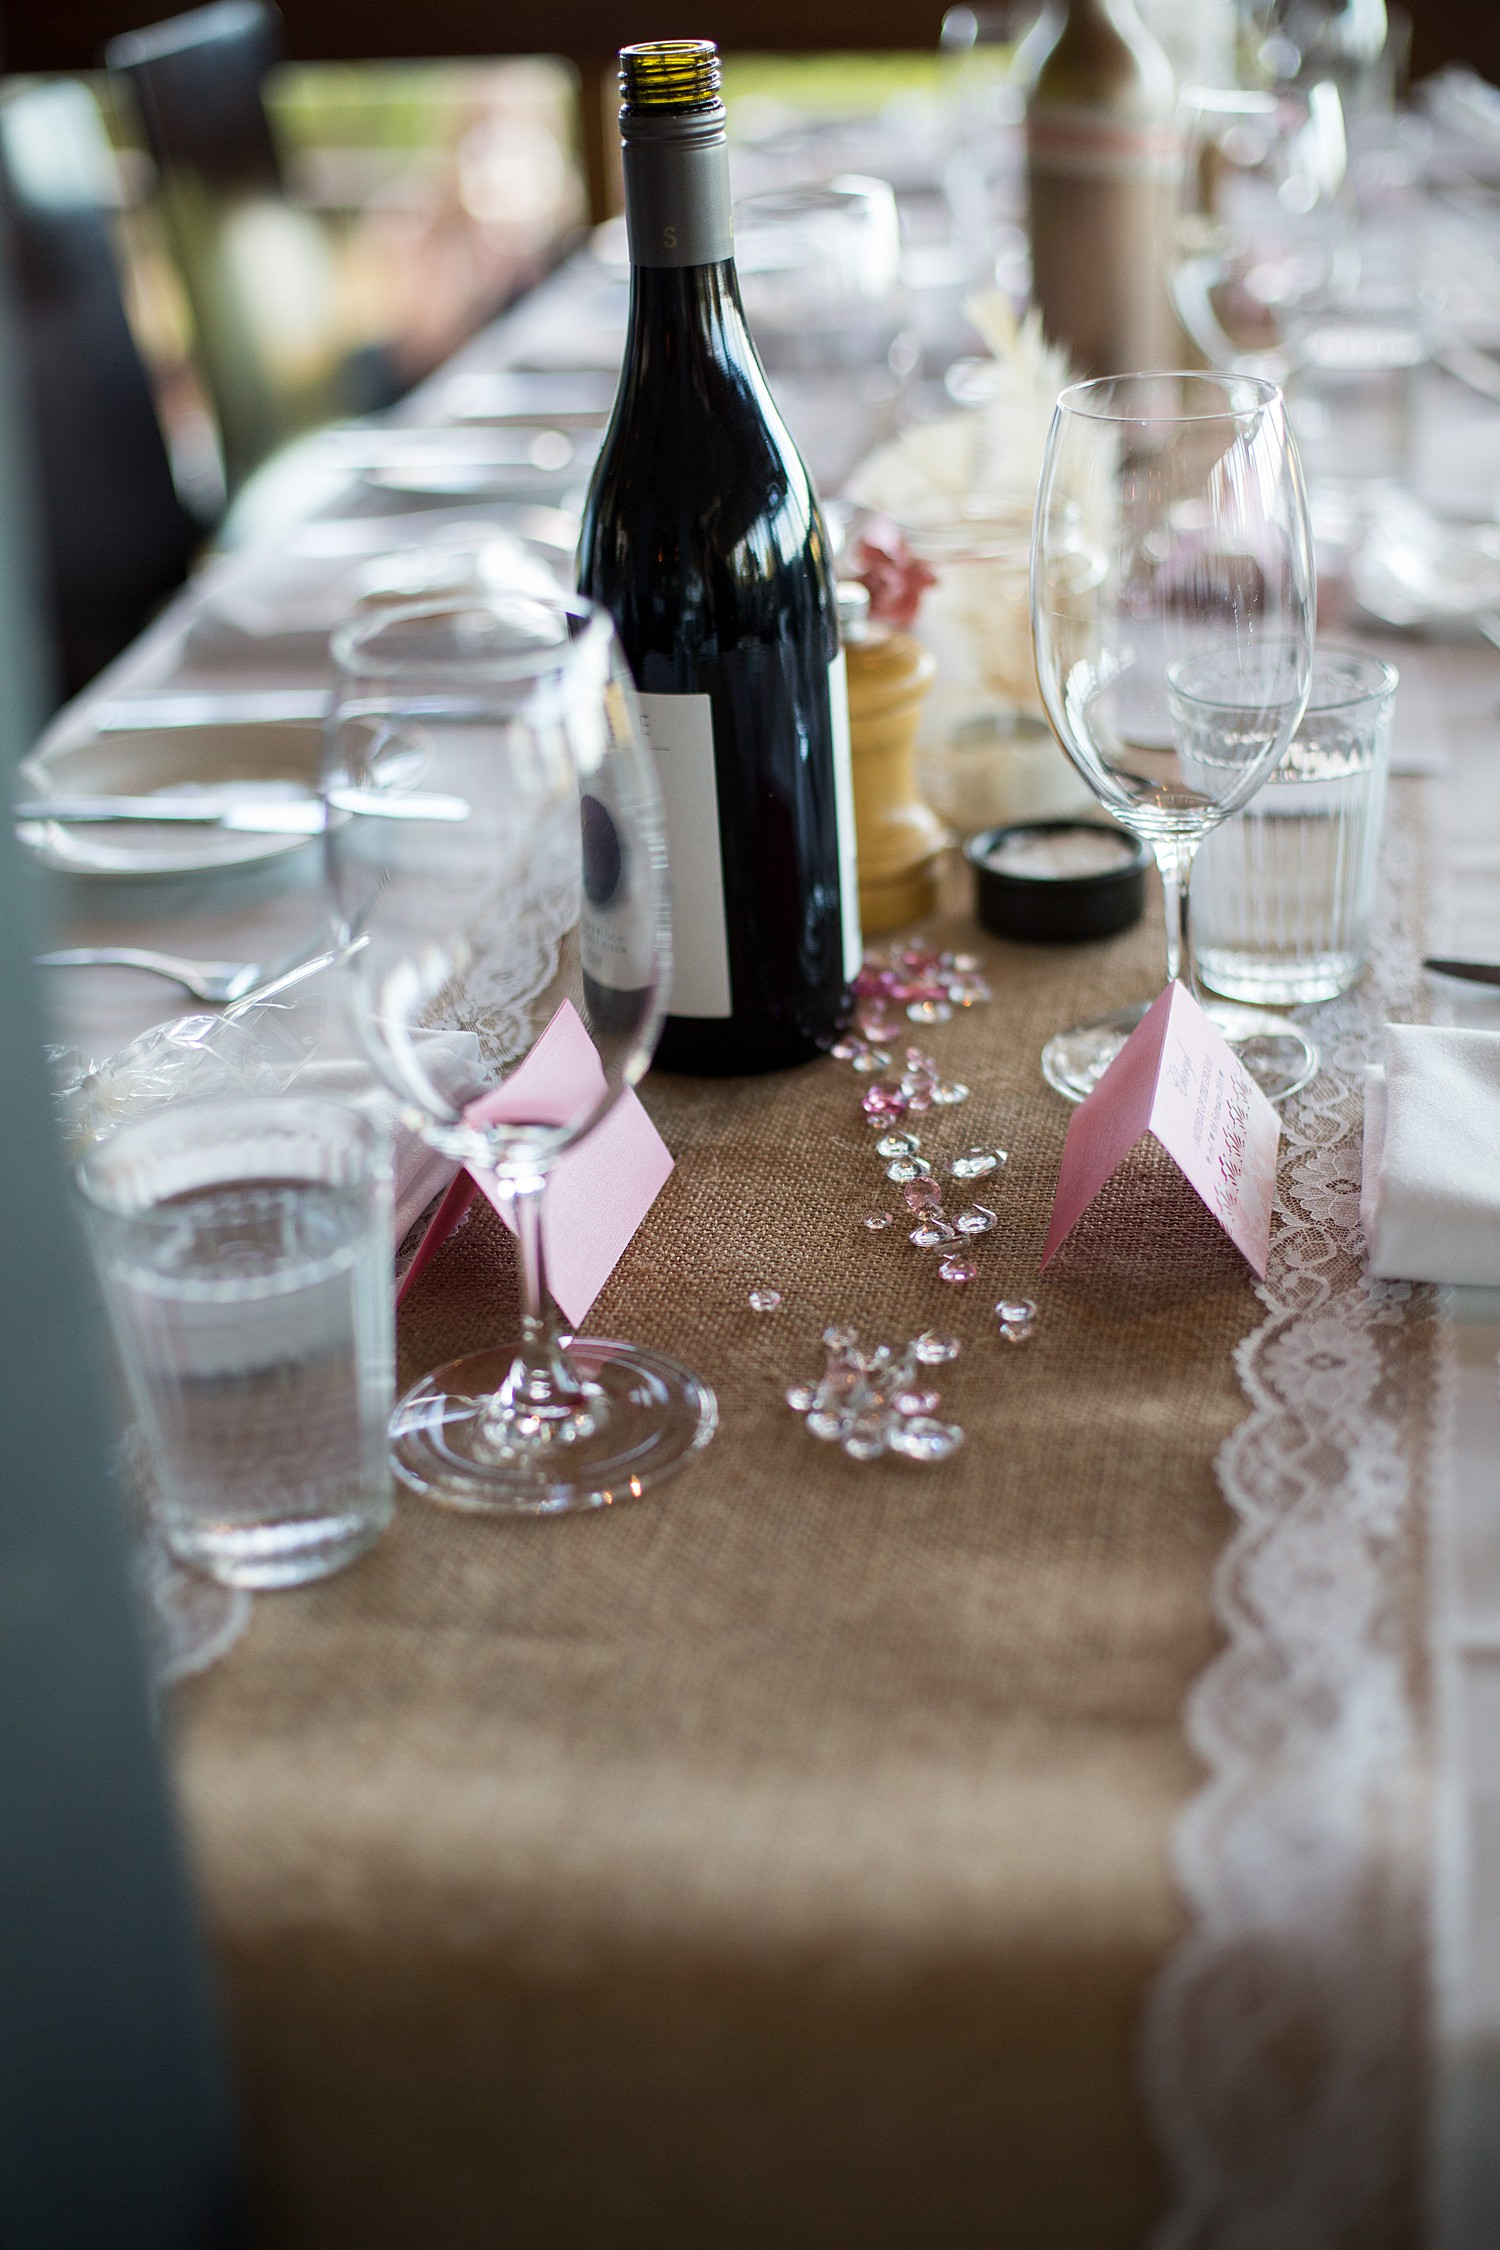 wise_wines_southwest_WA_wedding_0125.jpg